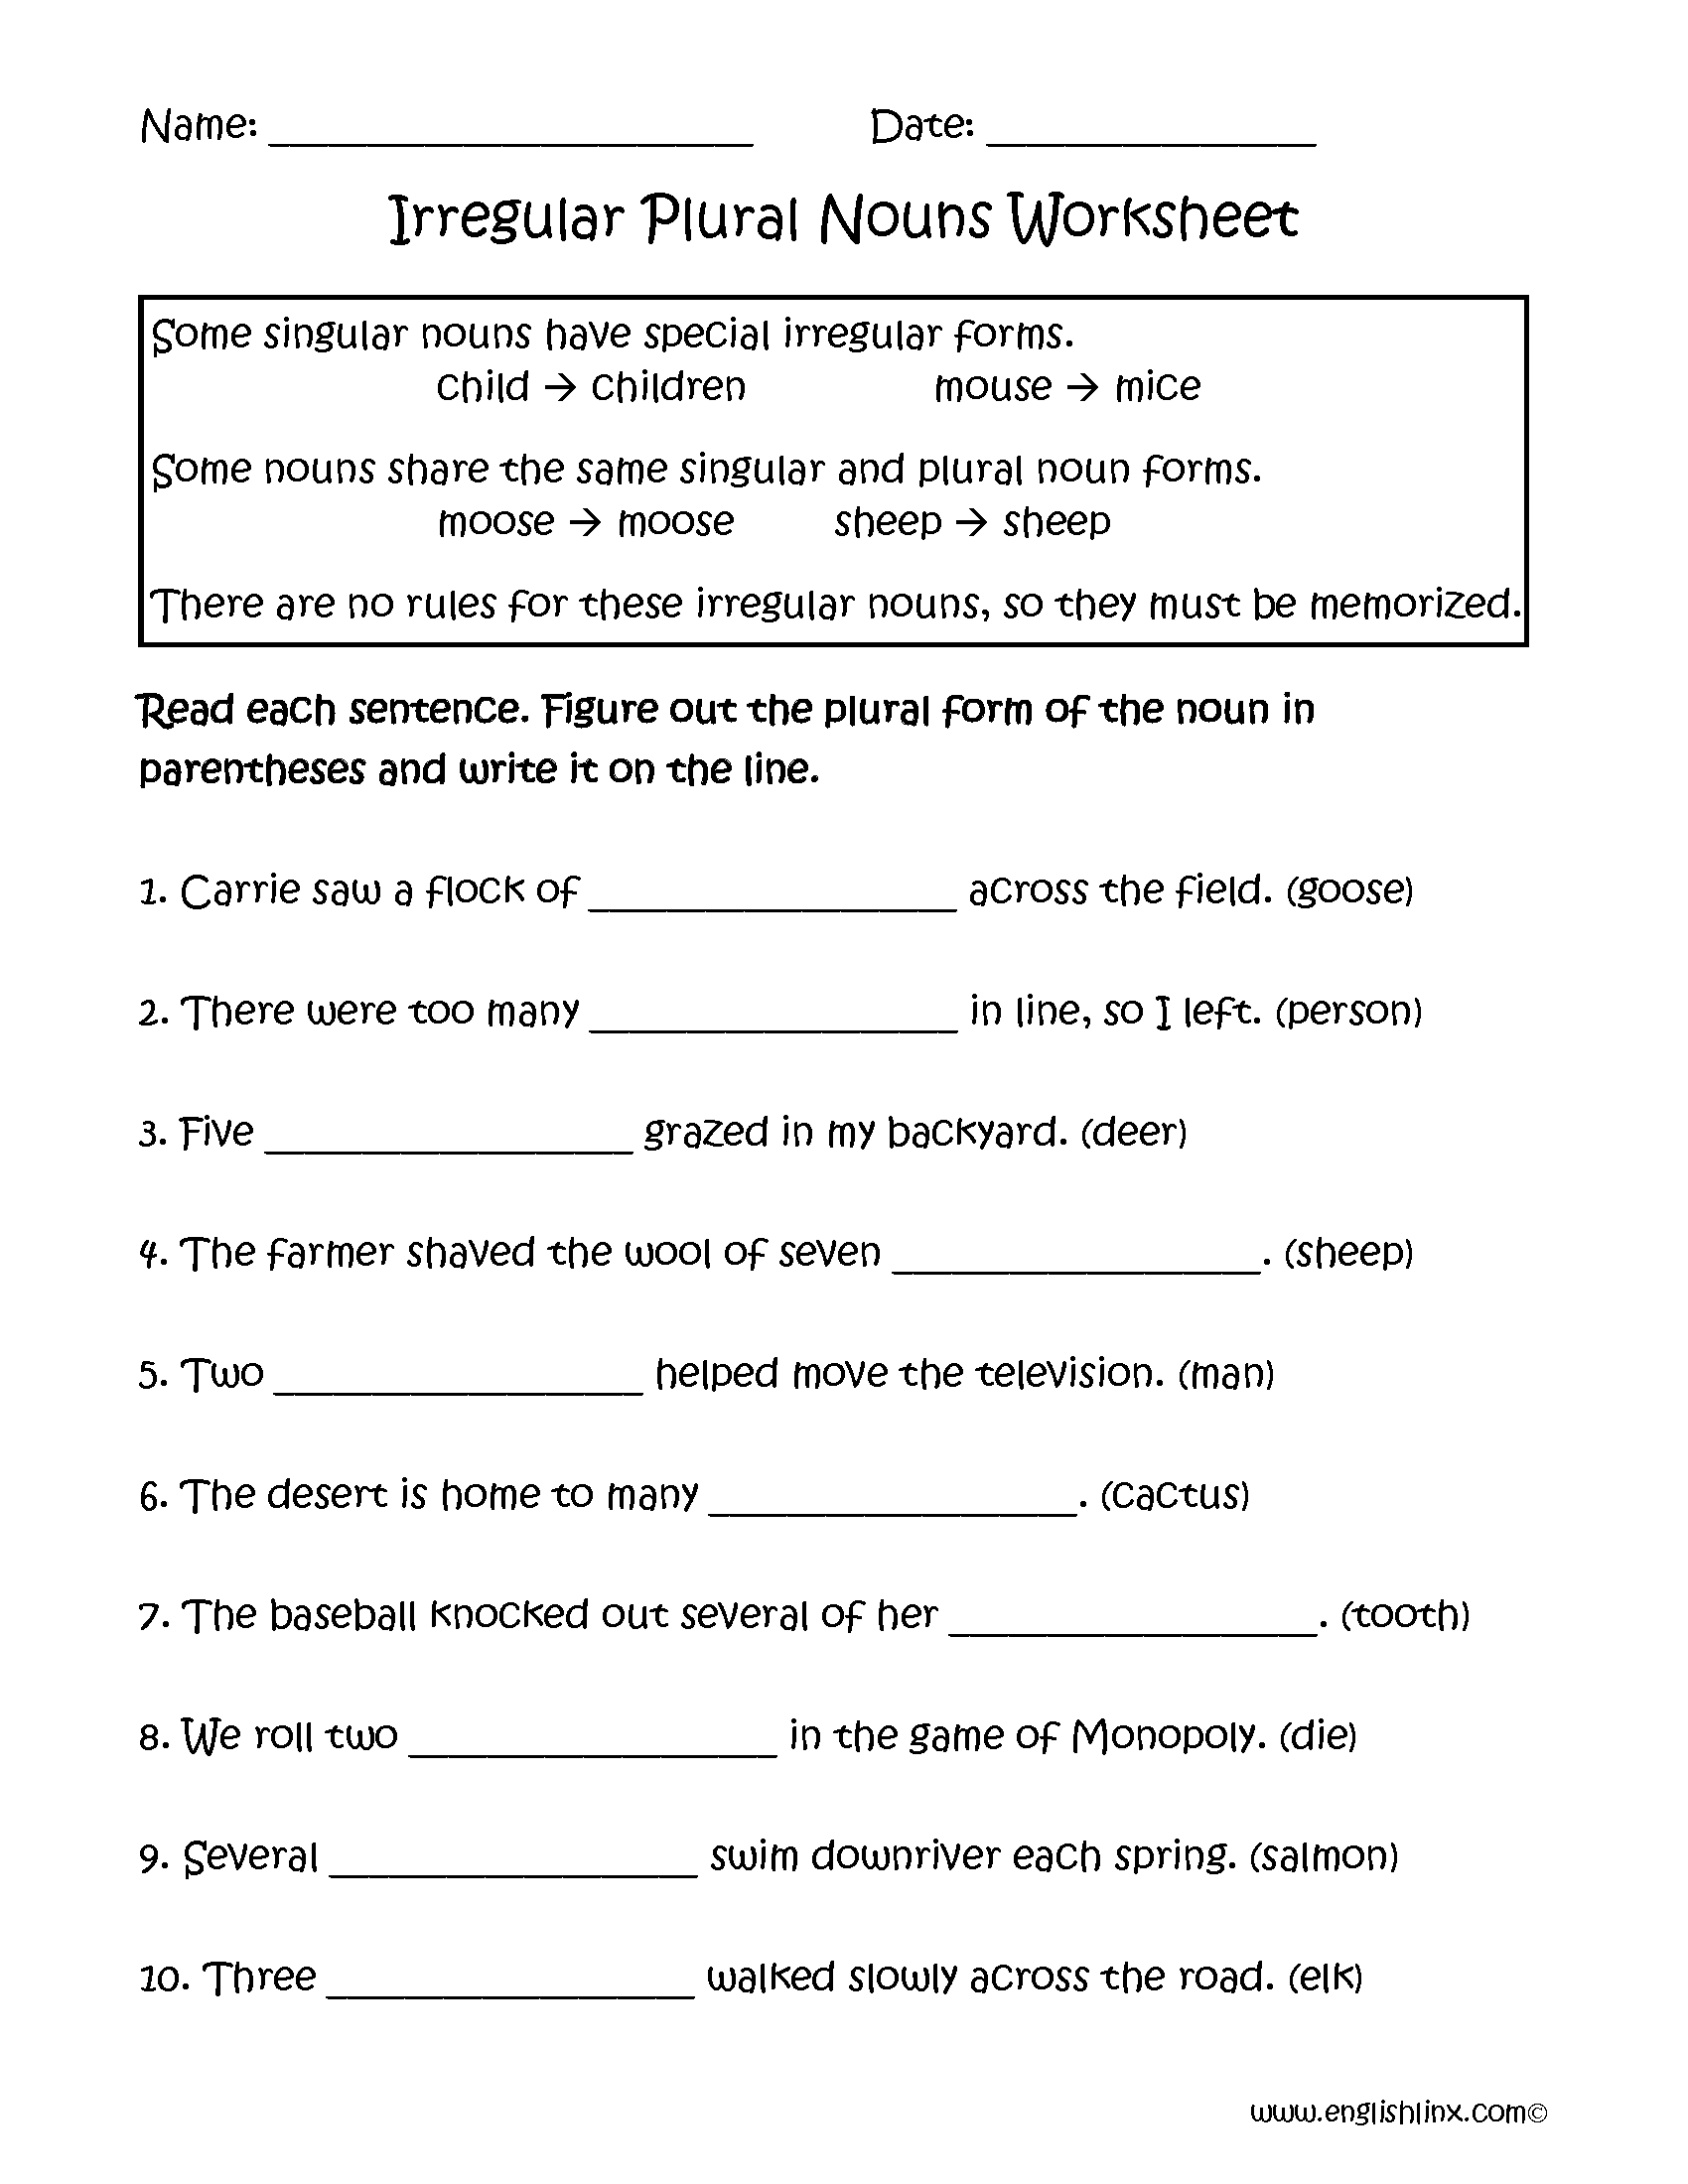 Worksheets Noun Worksheets irregular plural nouns worksheets ell spanish french worksheets